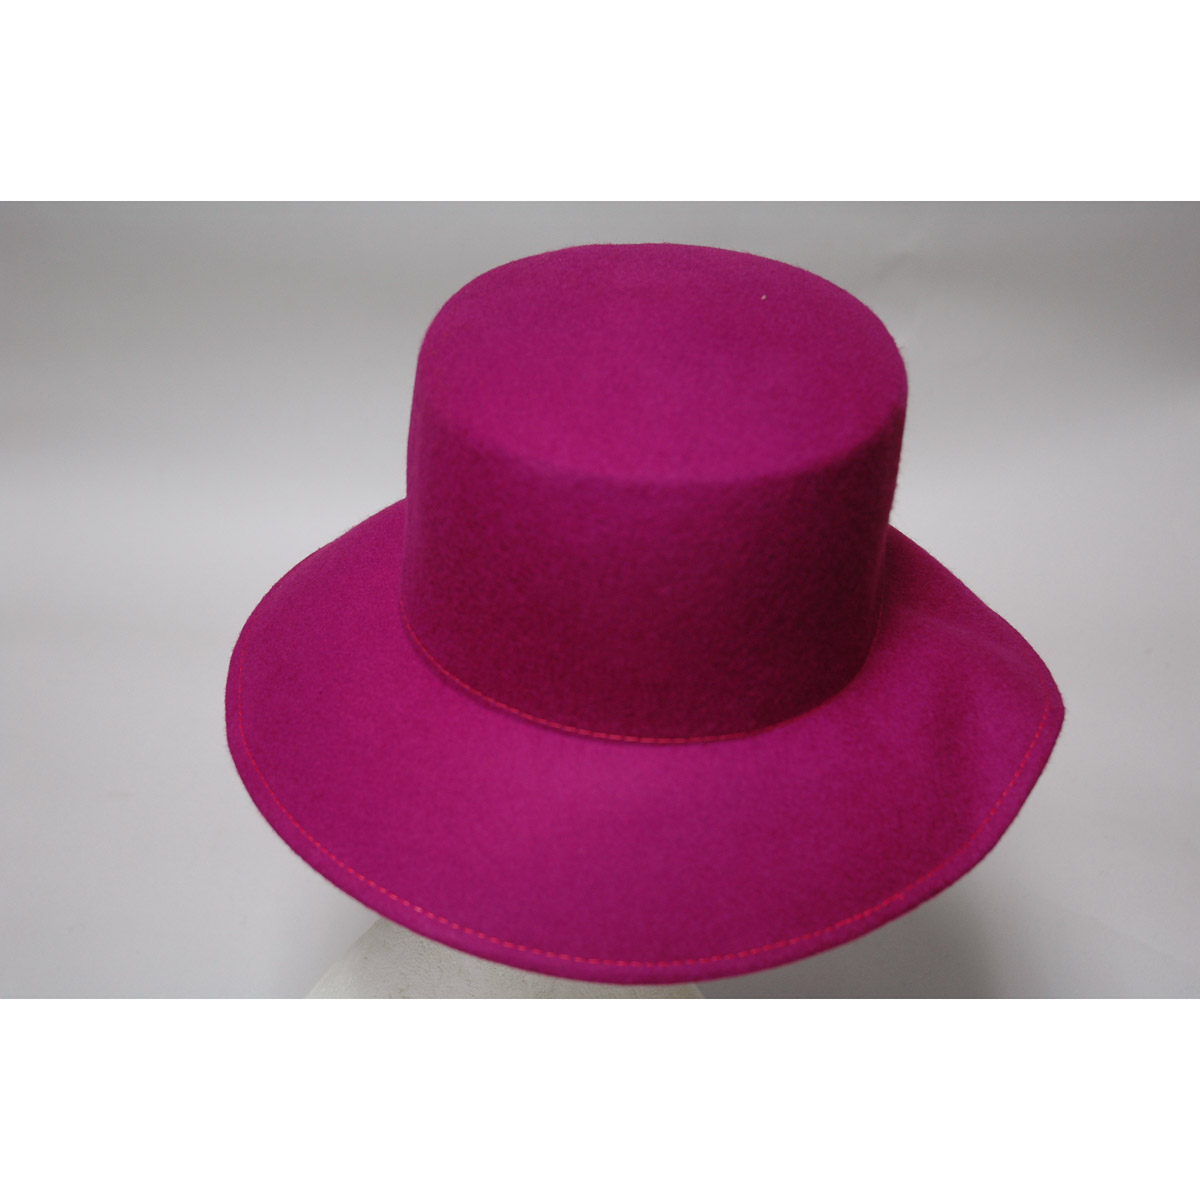 bf684b27abb82 Fuchsia Lampshade Small Brim Flat Top Blocked Untrimmed Felt Hat Base